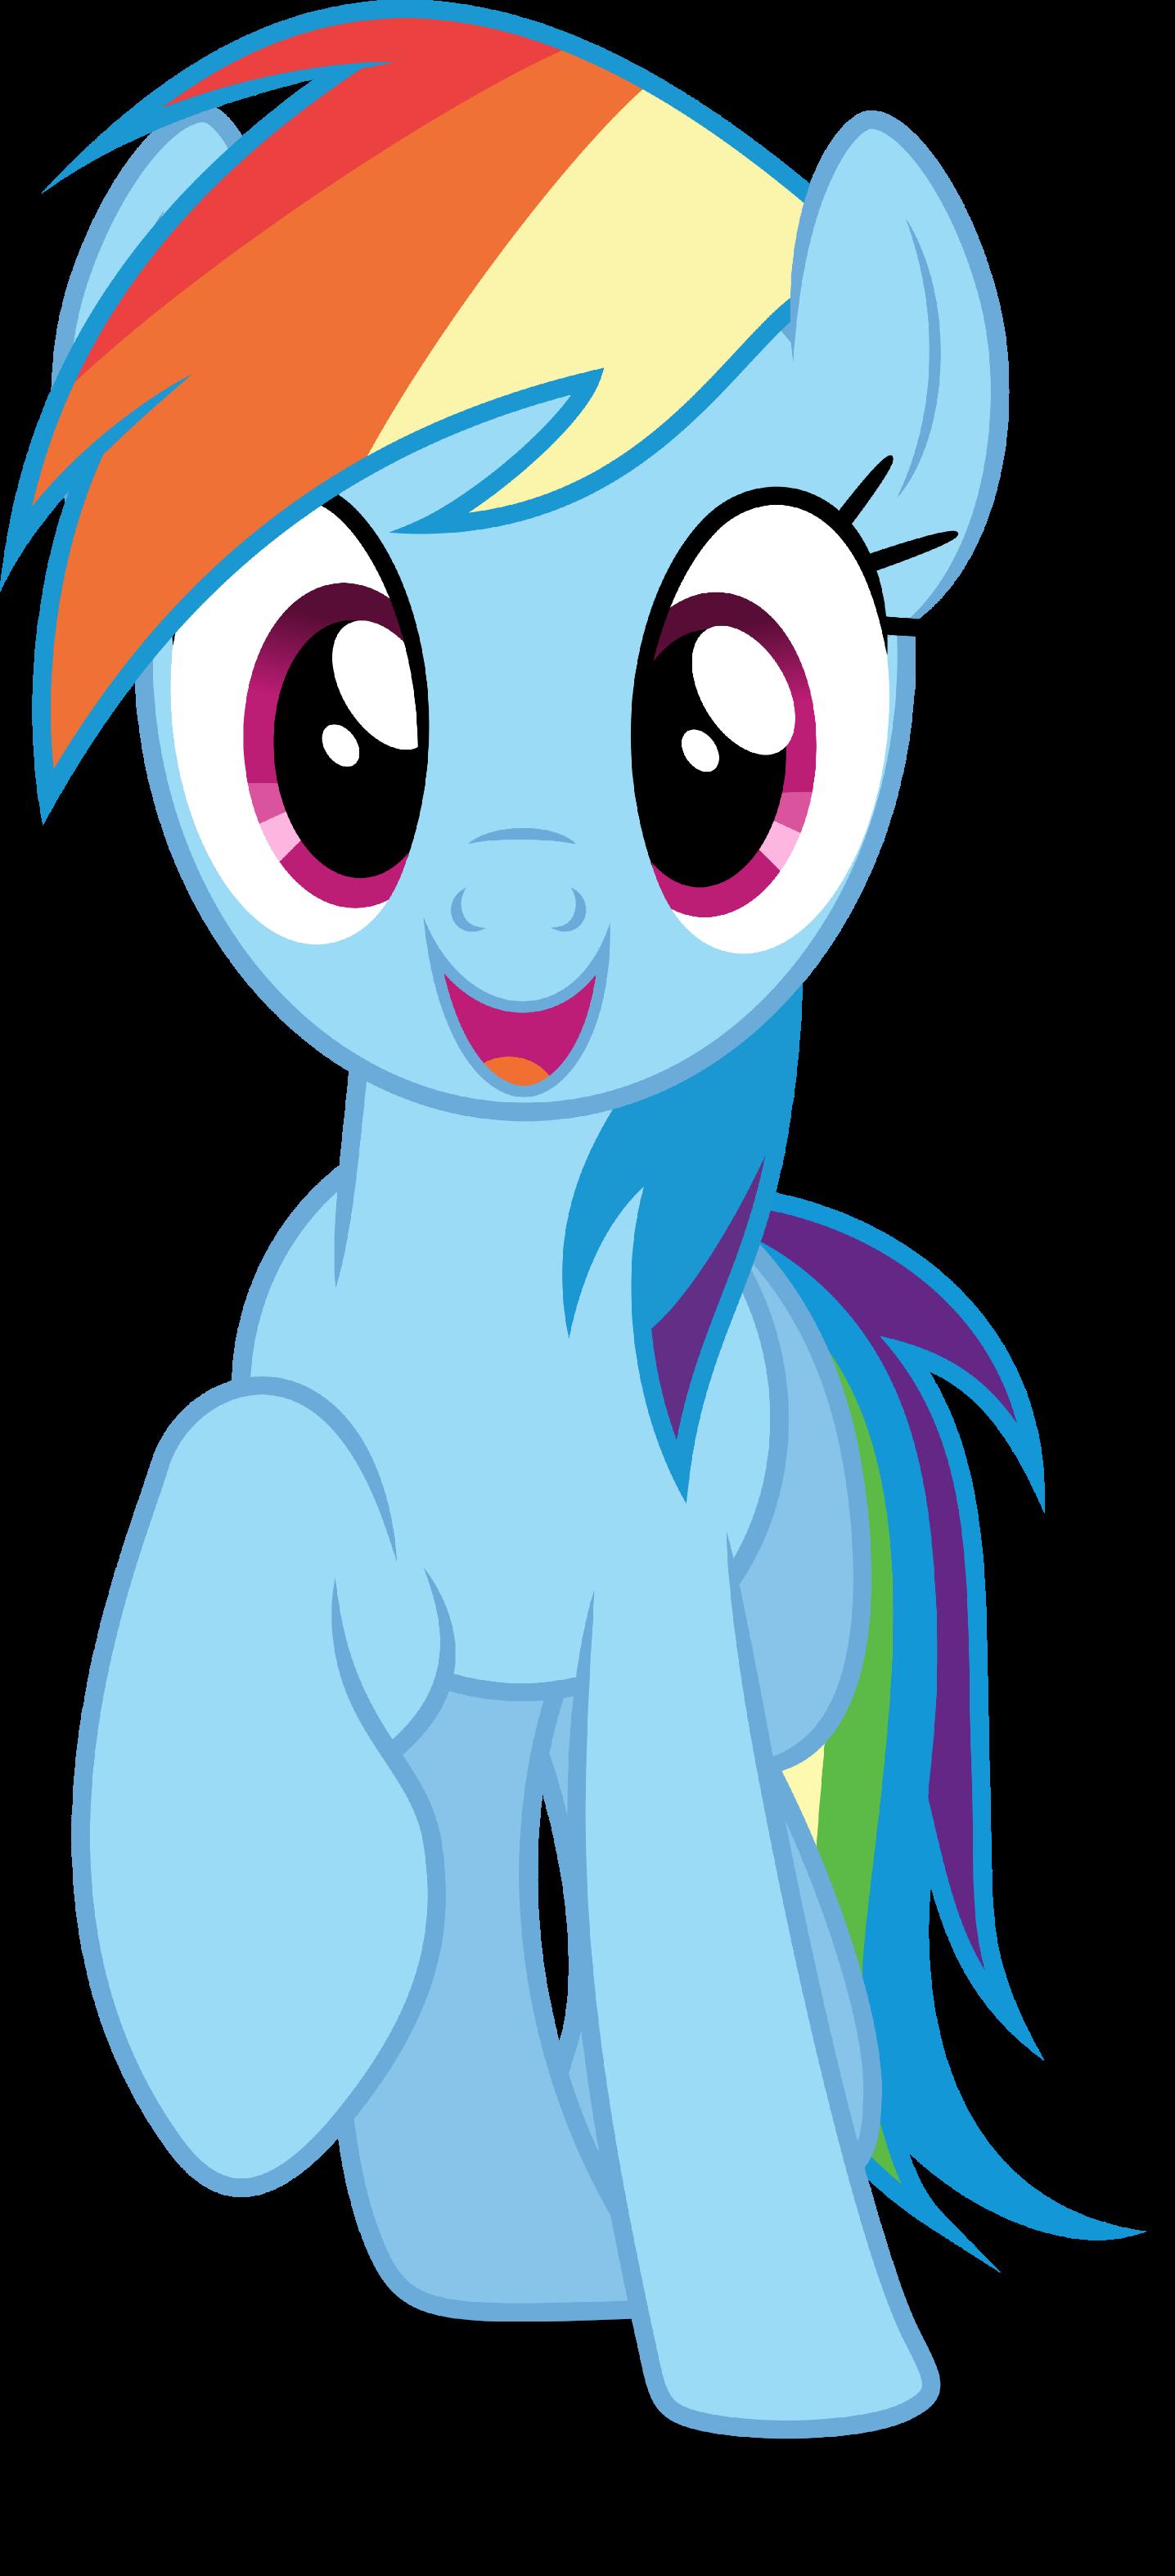 Rainbow Dash Vector By Dashiesparkle On Deviantart My Little Pony Pictures Rainbow Dash Mlp My Little Pony